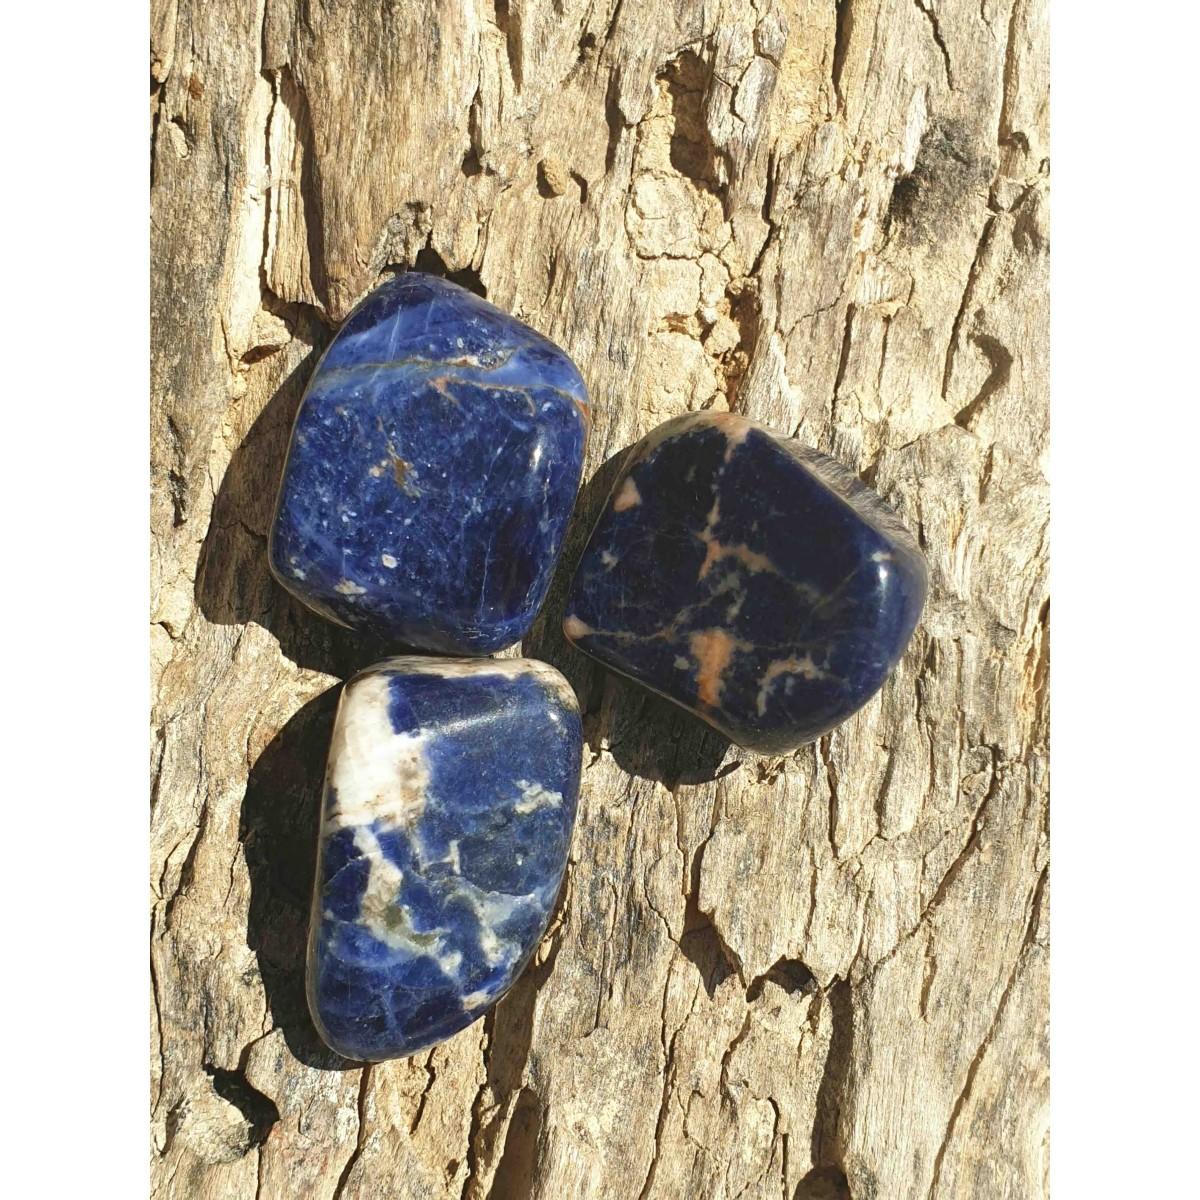 Sodalite (pierre roulée)